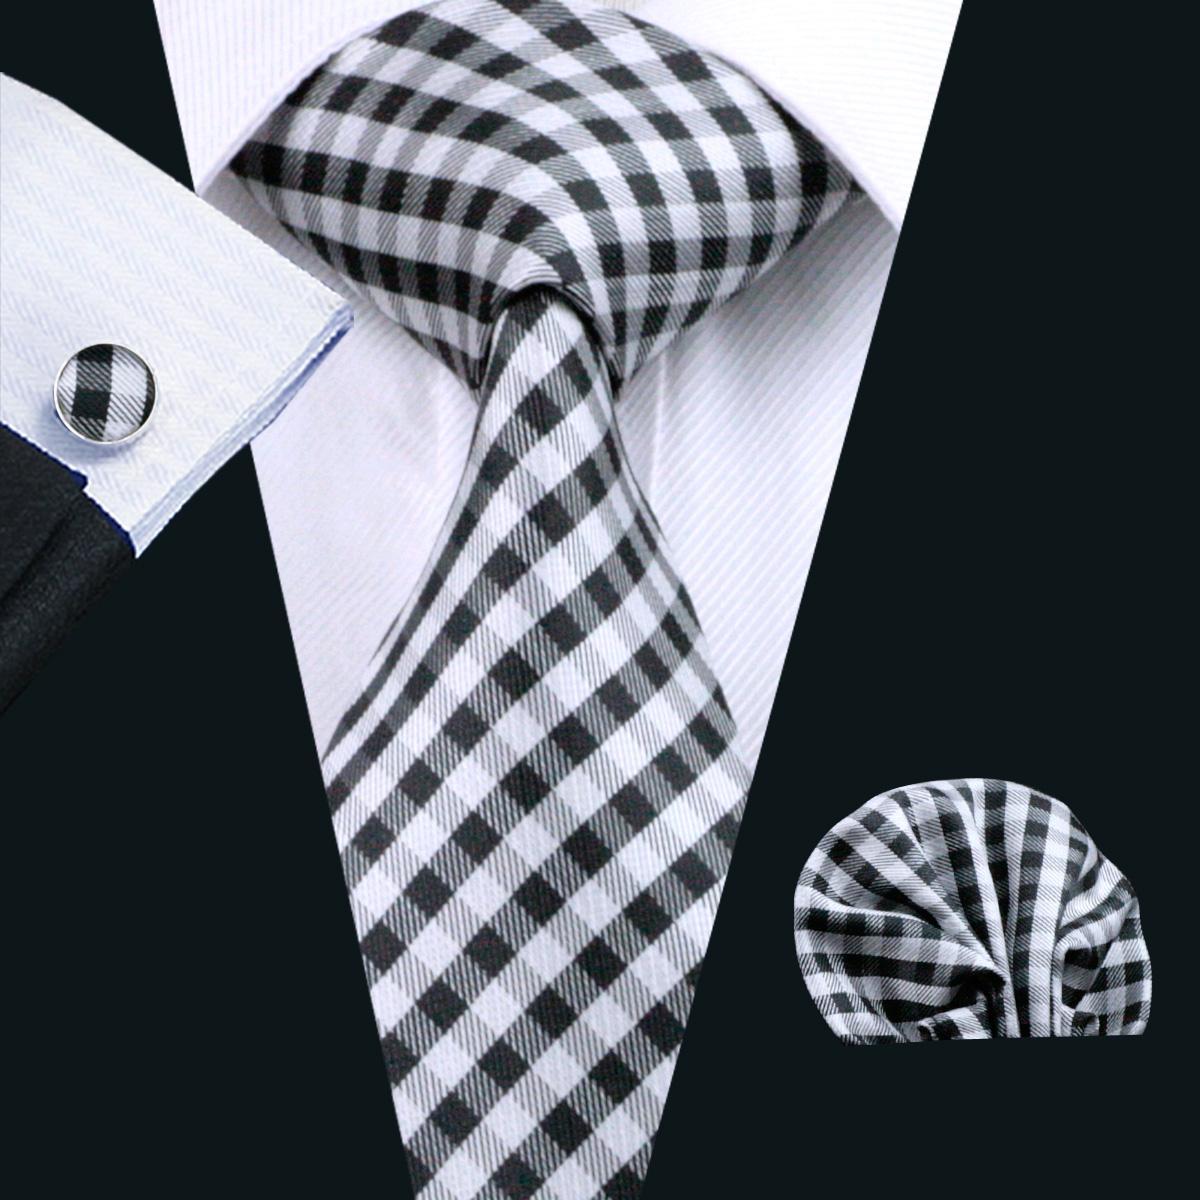 Silk Mens Tie Set Black Plaid Pocket Square Manchetknopen Klassieke Zijde Jacquard Geweven Meeting Business Casual stropdas N-1024